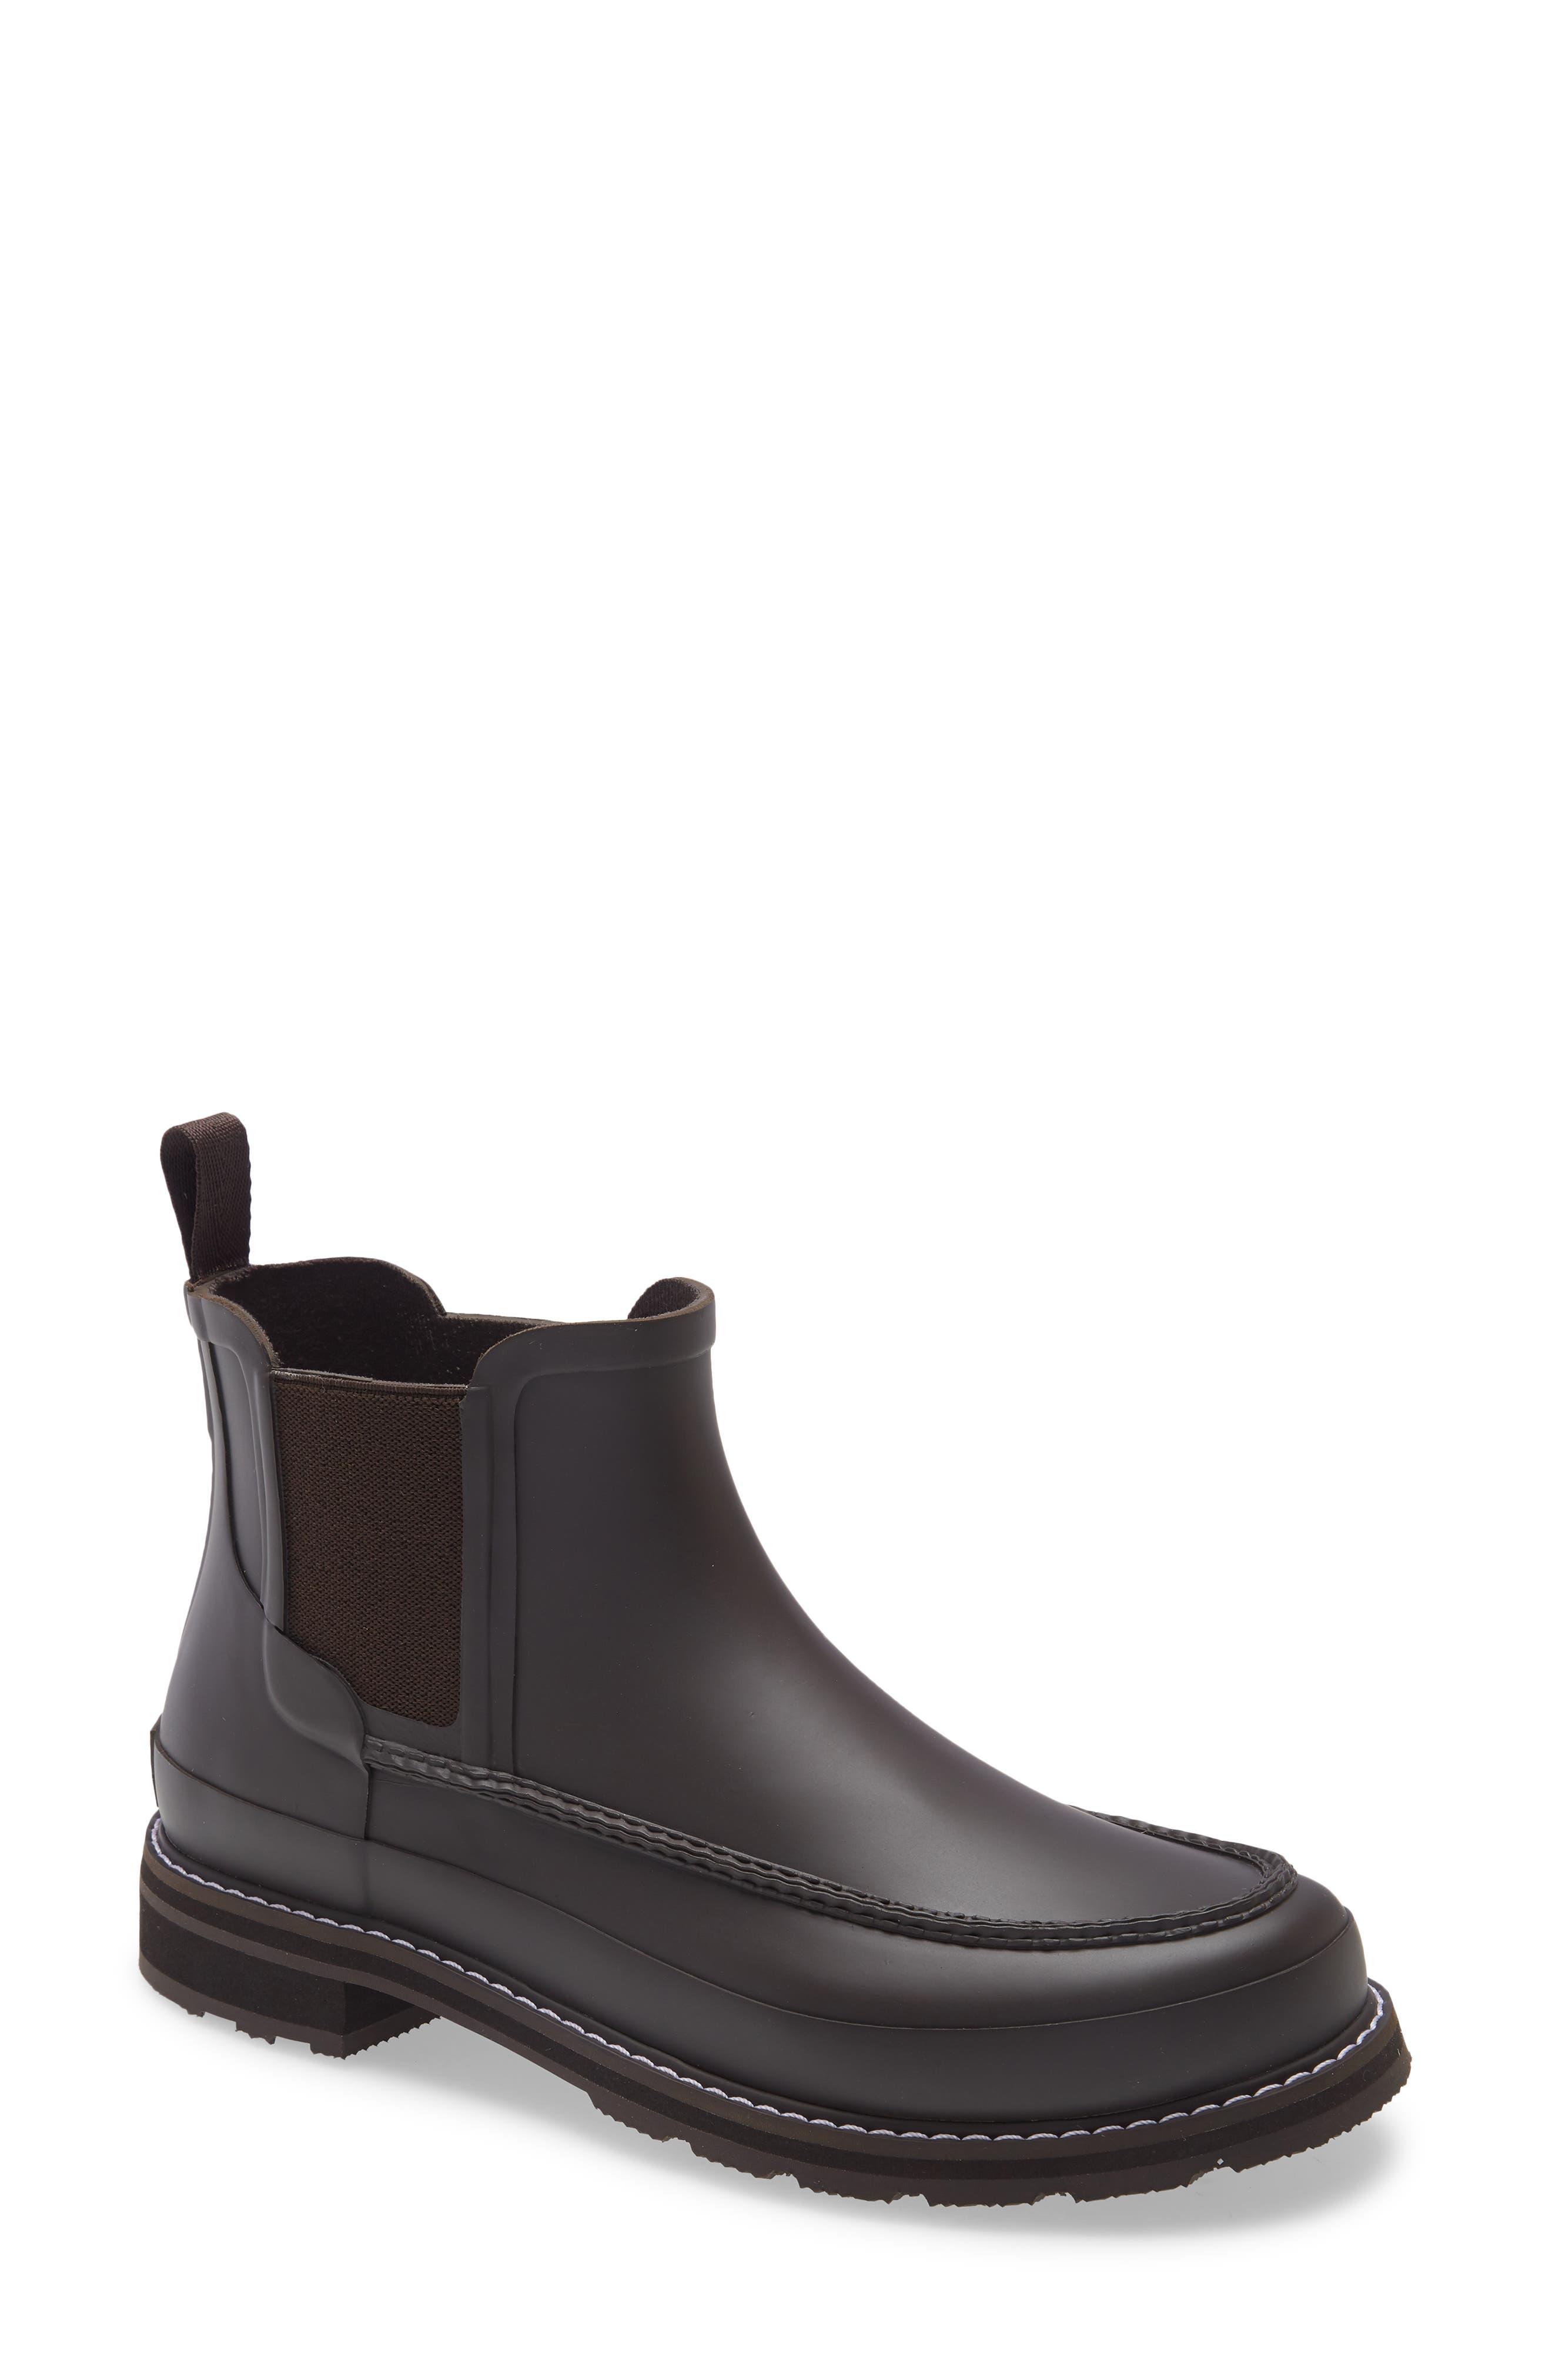 Moc Toe Waterproof Chelsea Rain Boot